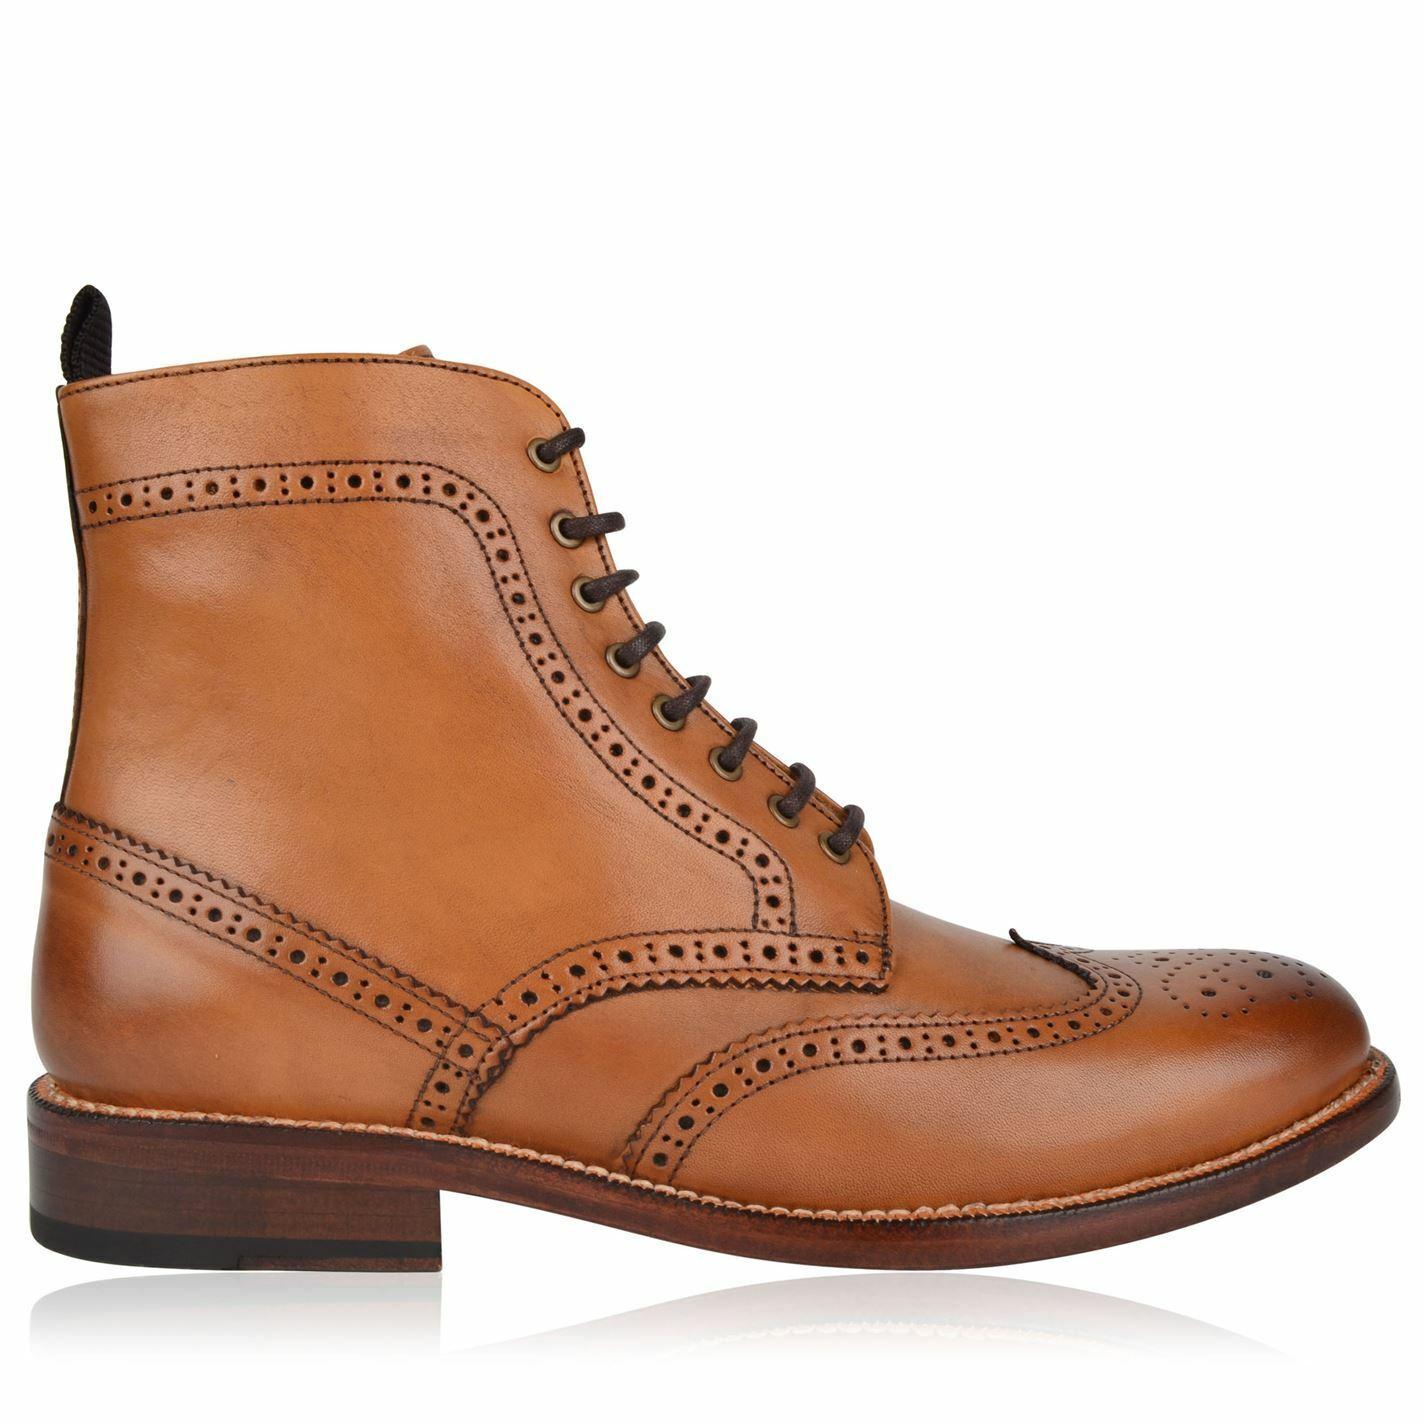 Mens Full Circle Brogue Boot Formal Boots shoes New